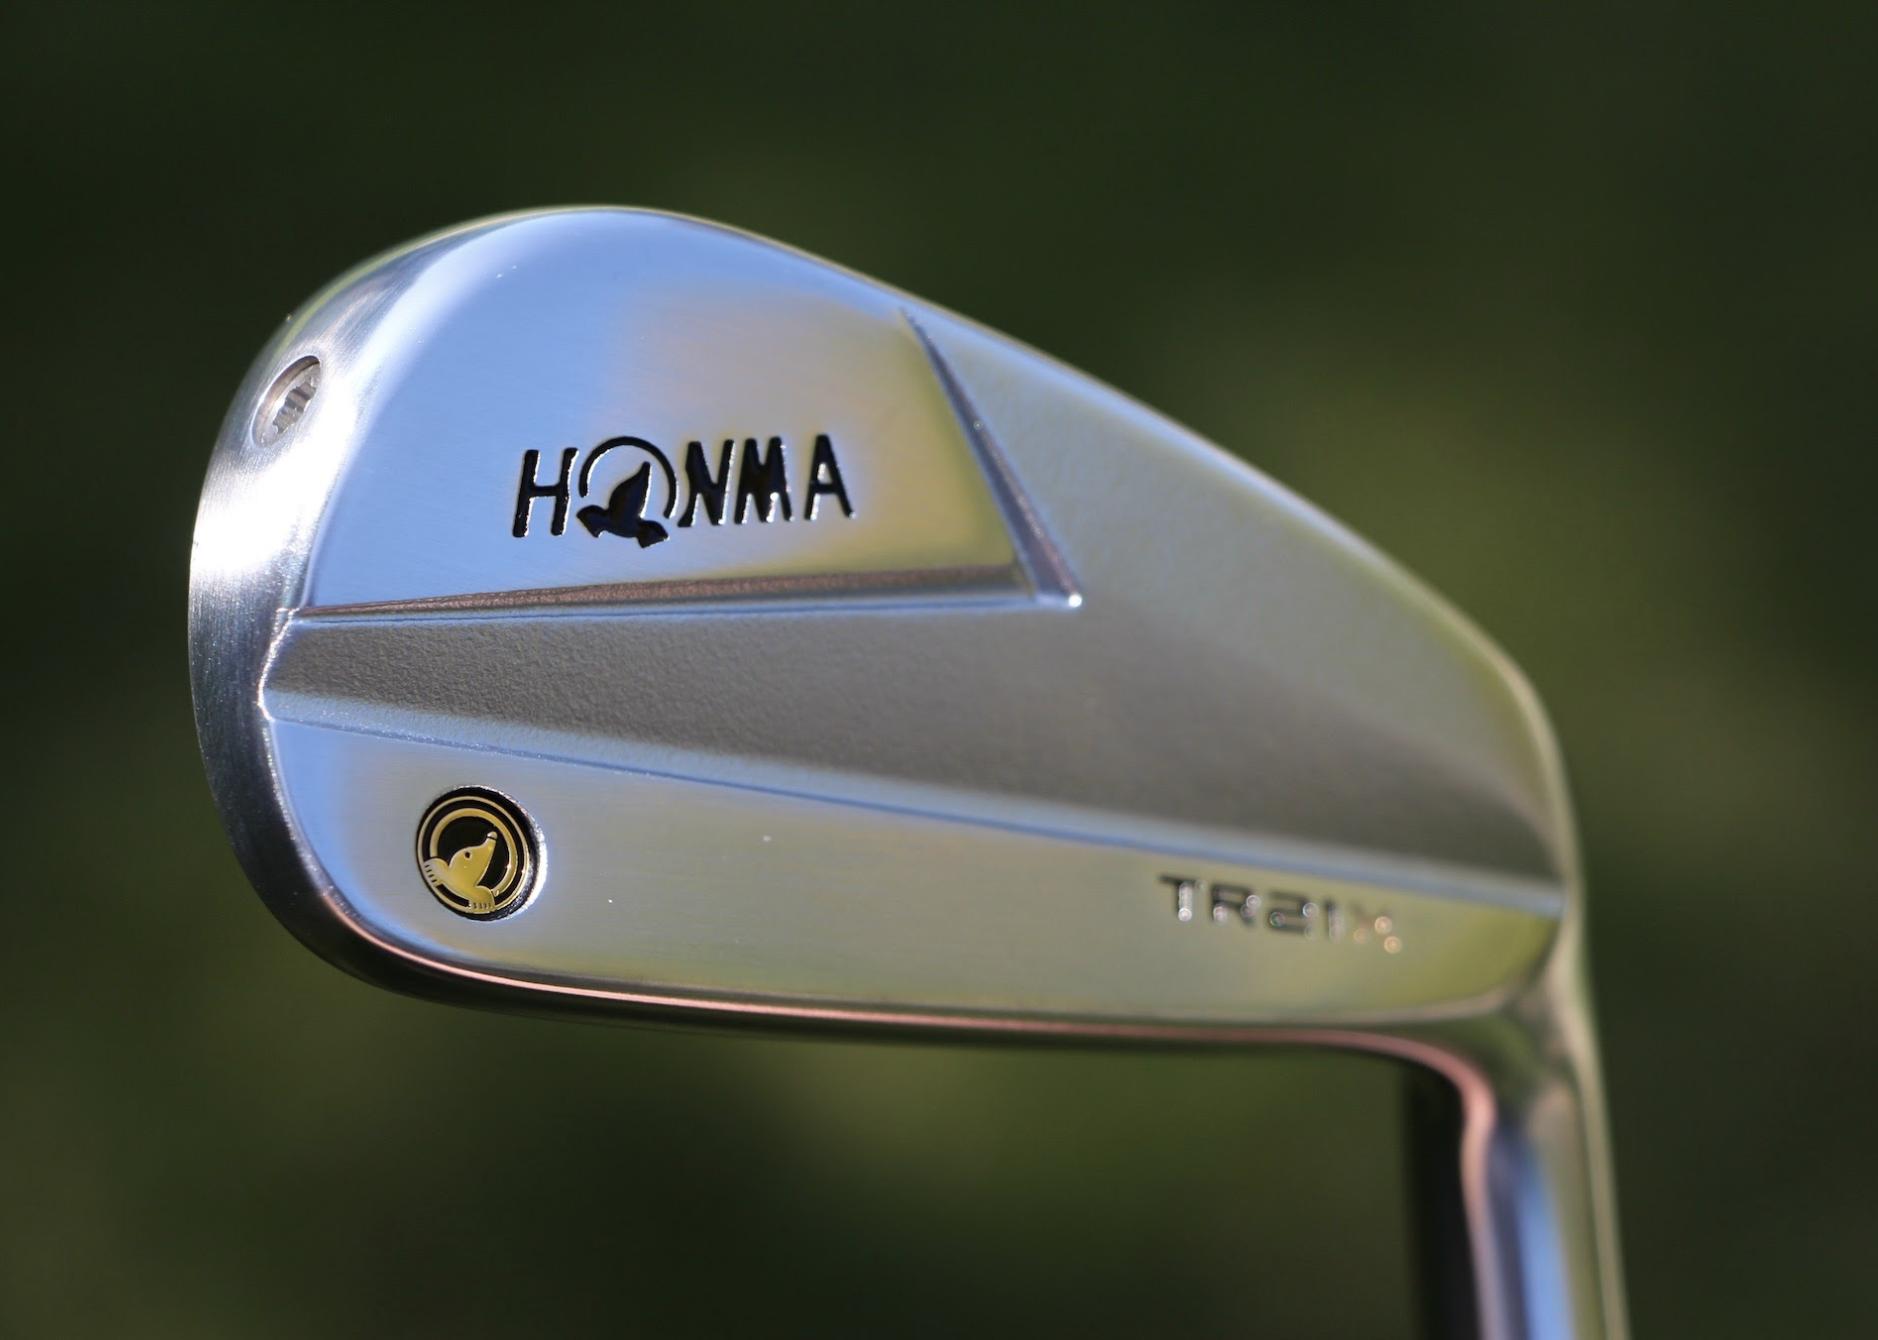 Honma TR21X Irons back